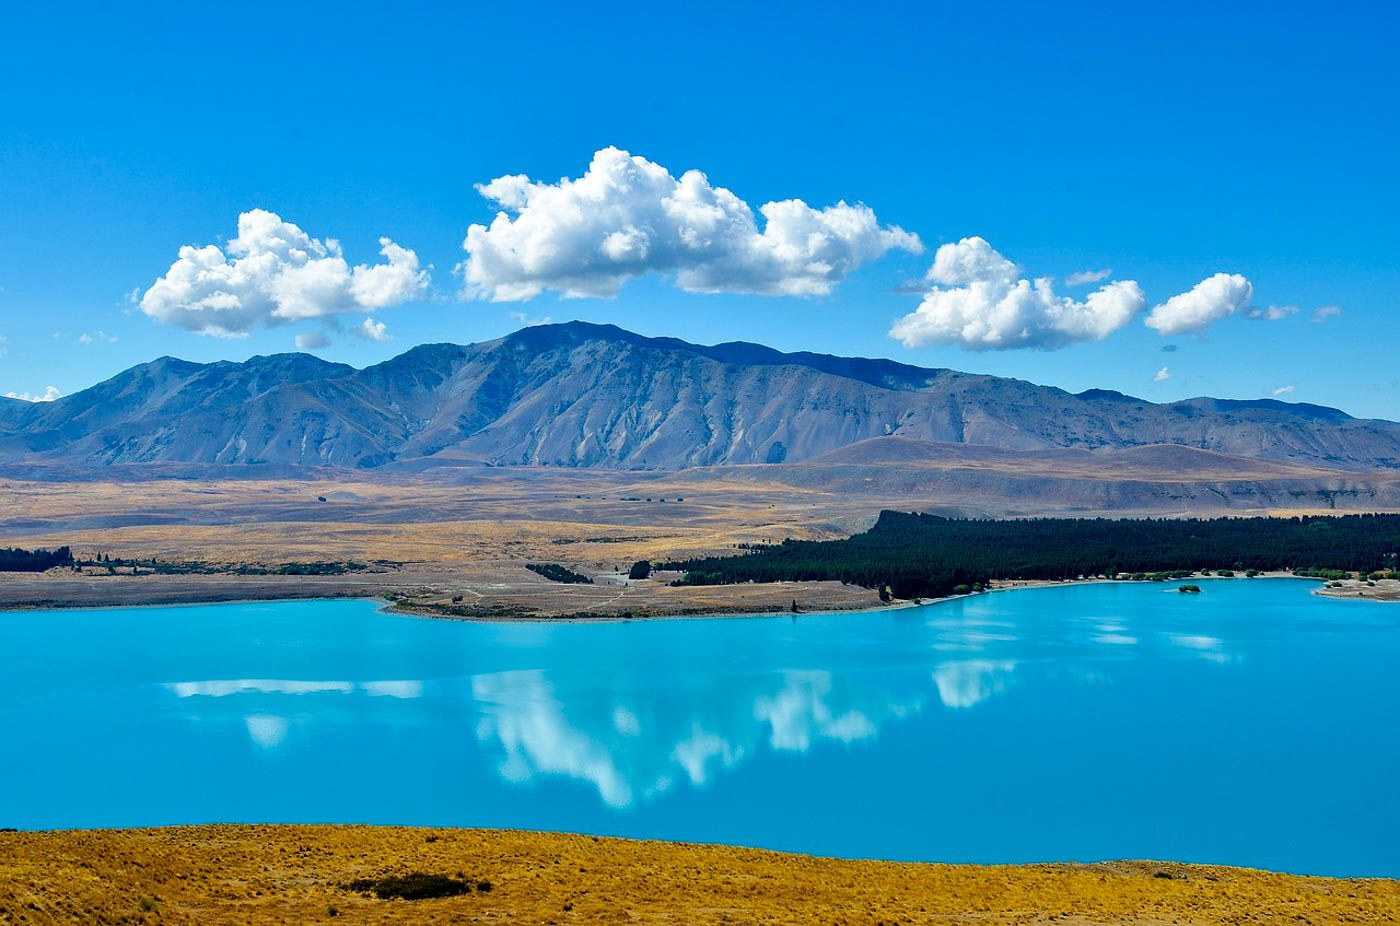 Lake Tekapo Travel Cost - Average Price of a Vacation to ...